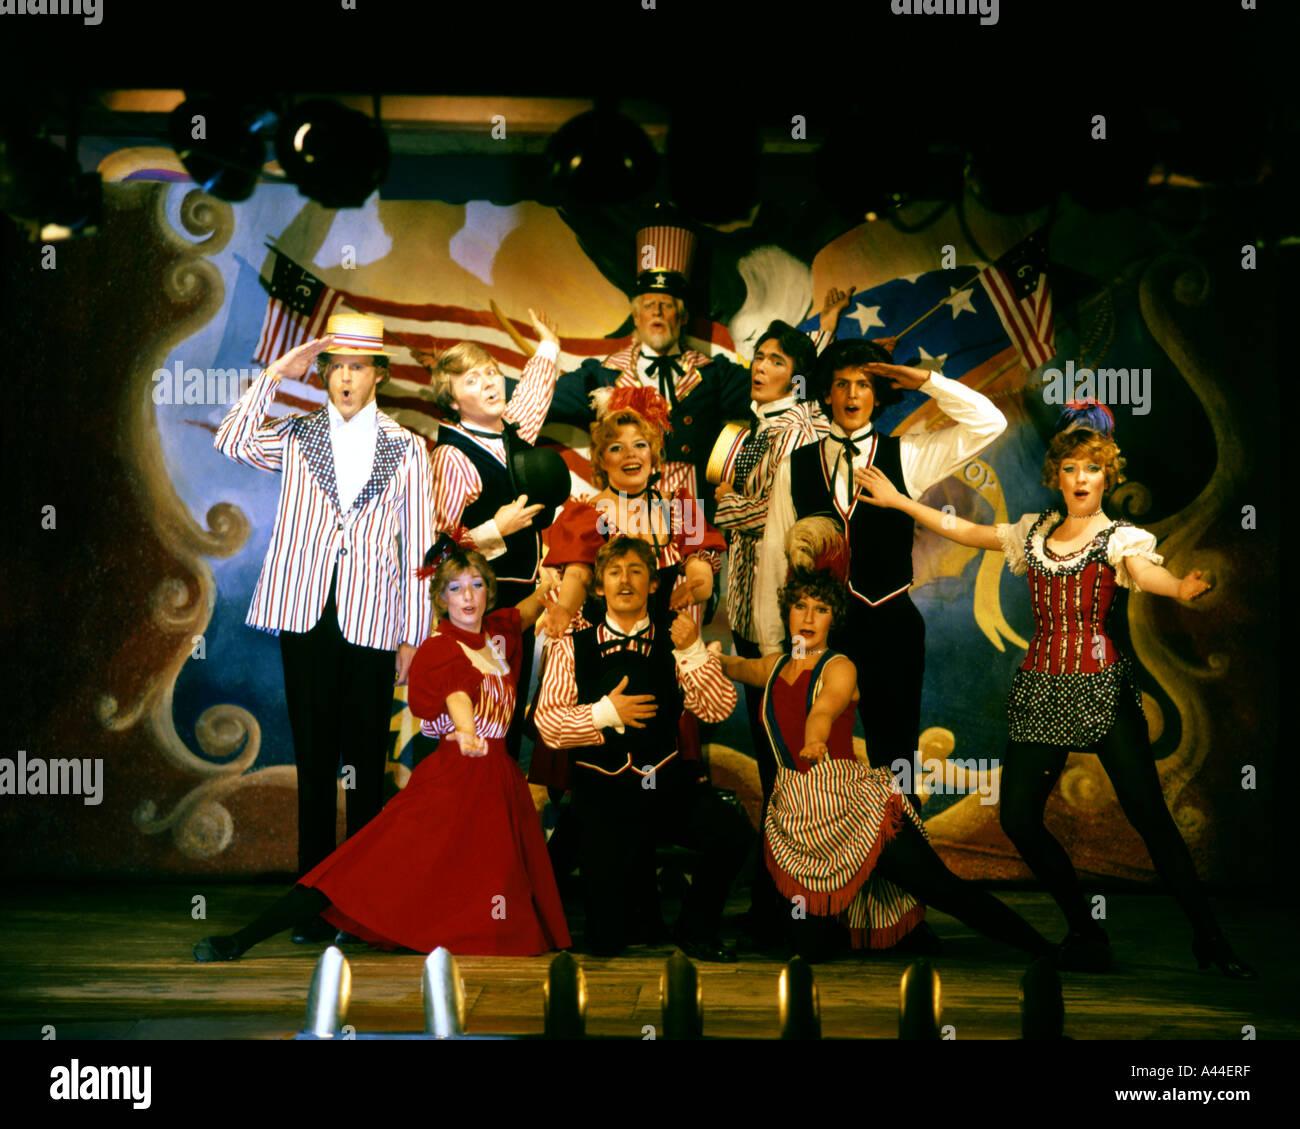 USA - MONTANA:  Virginia City Players at Virginia City Opera House, Montana, USA - Stock Image